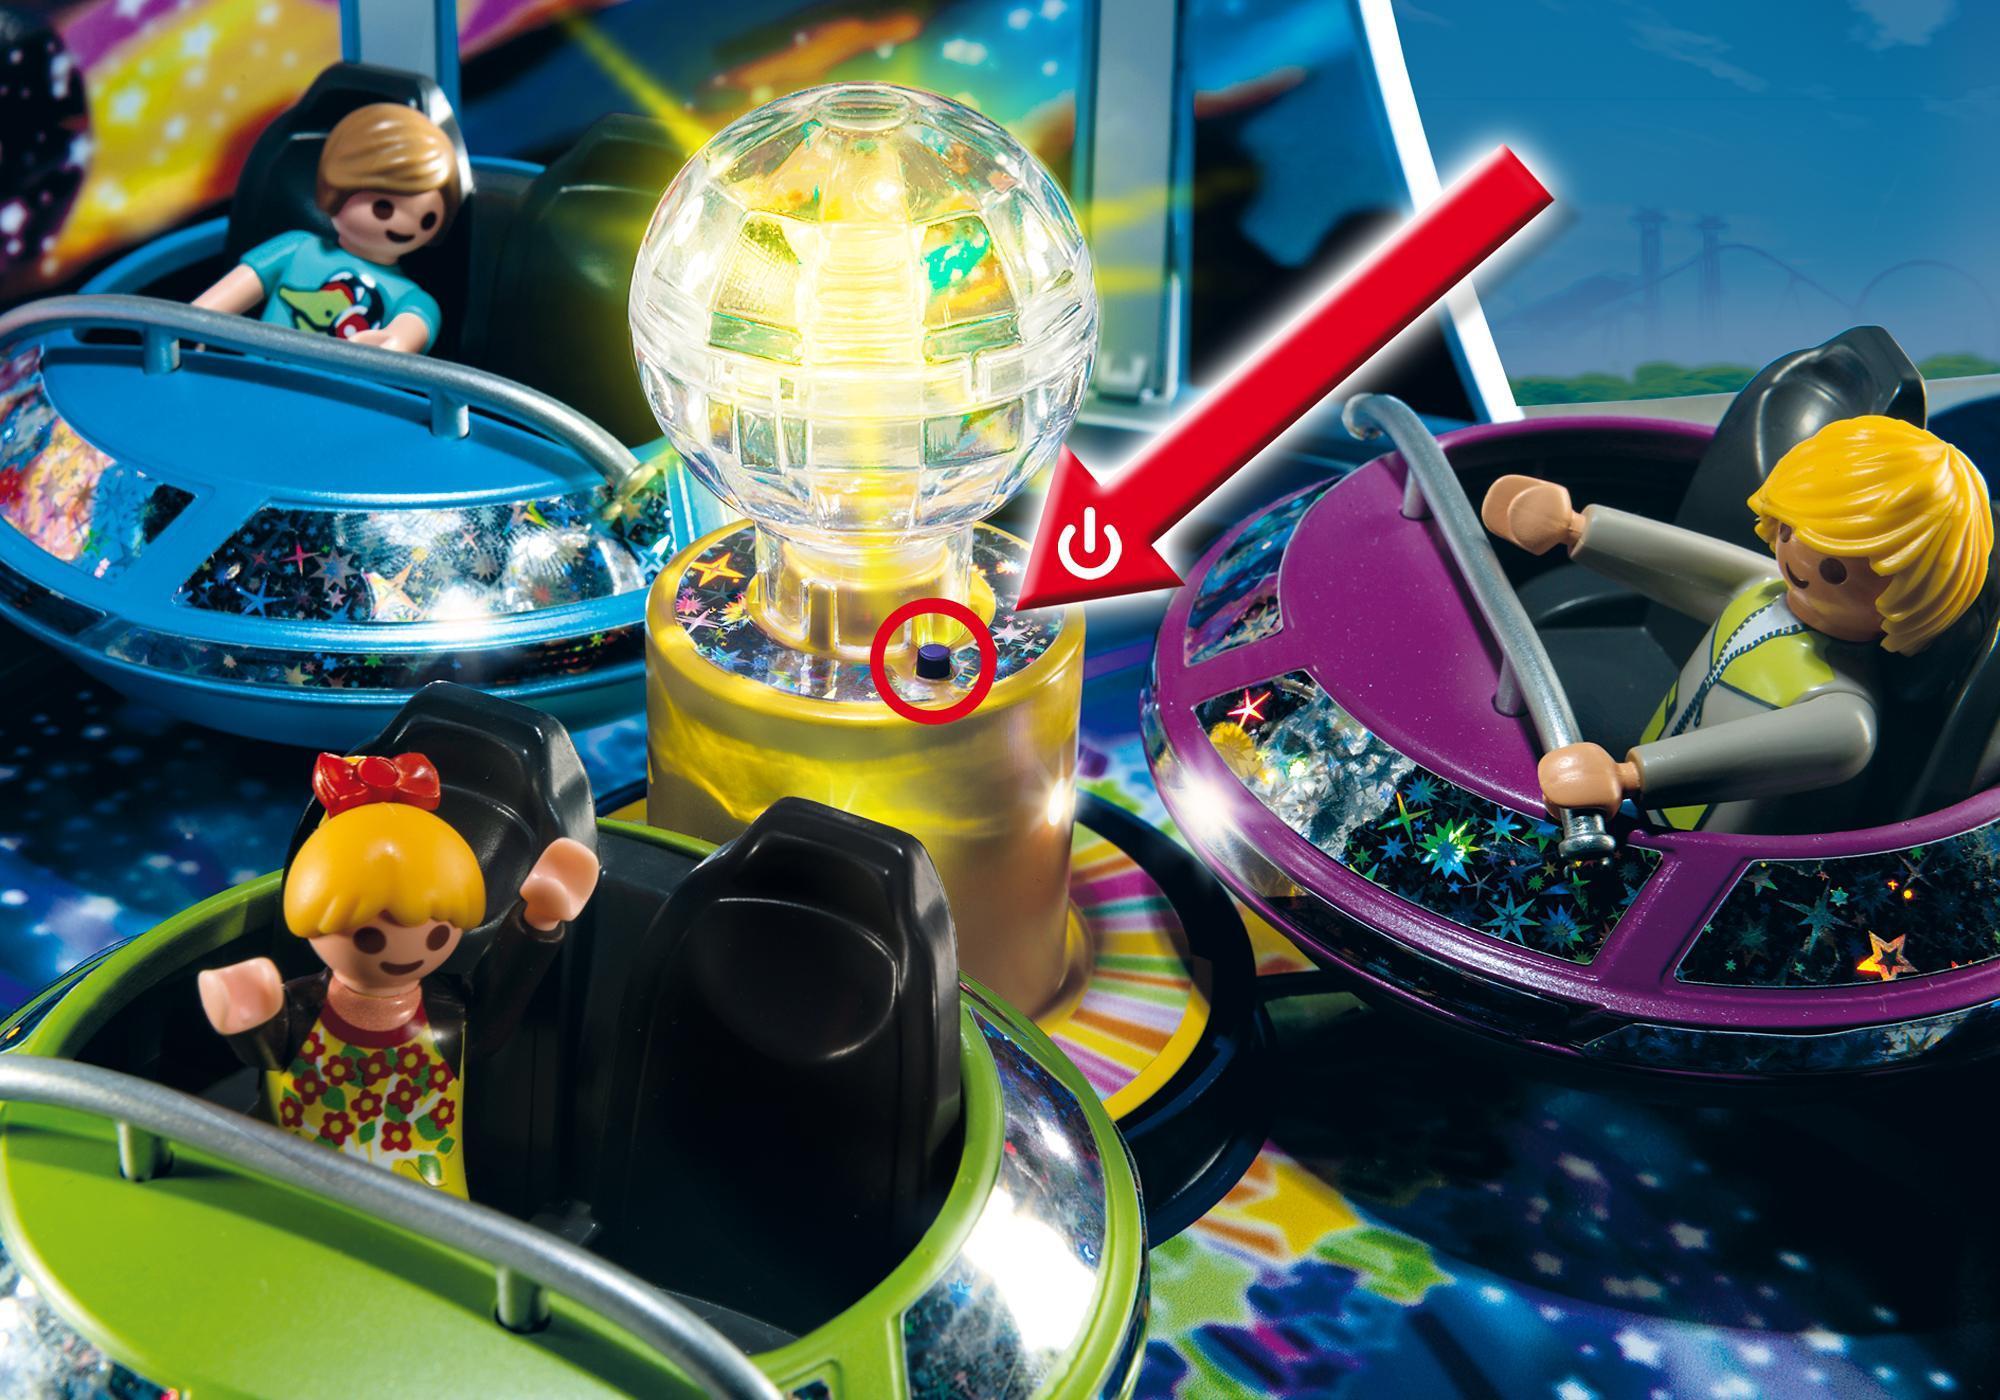 http://media.playmobil.com/i/playmobil/5554_product_extra2/Atracción de Naves Giratorias con Luces